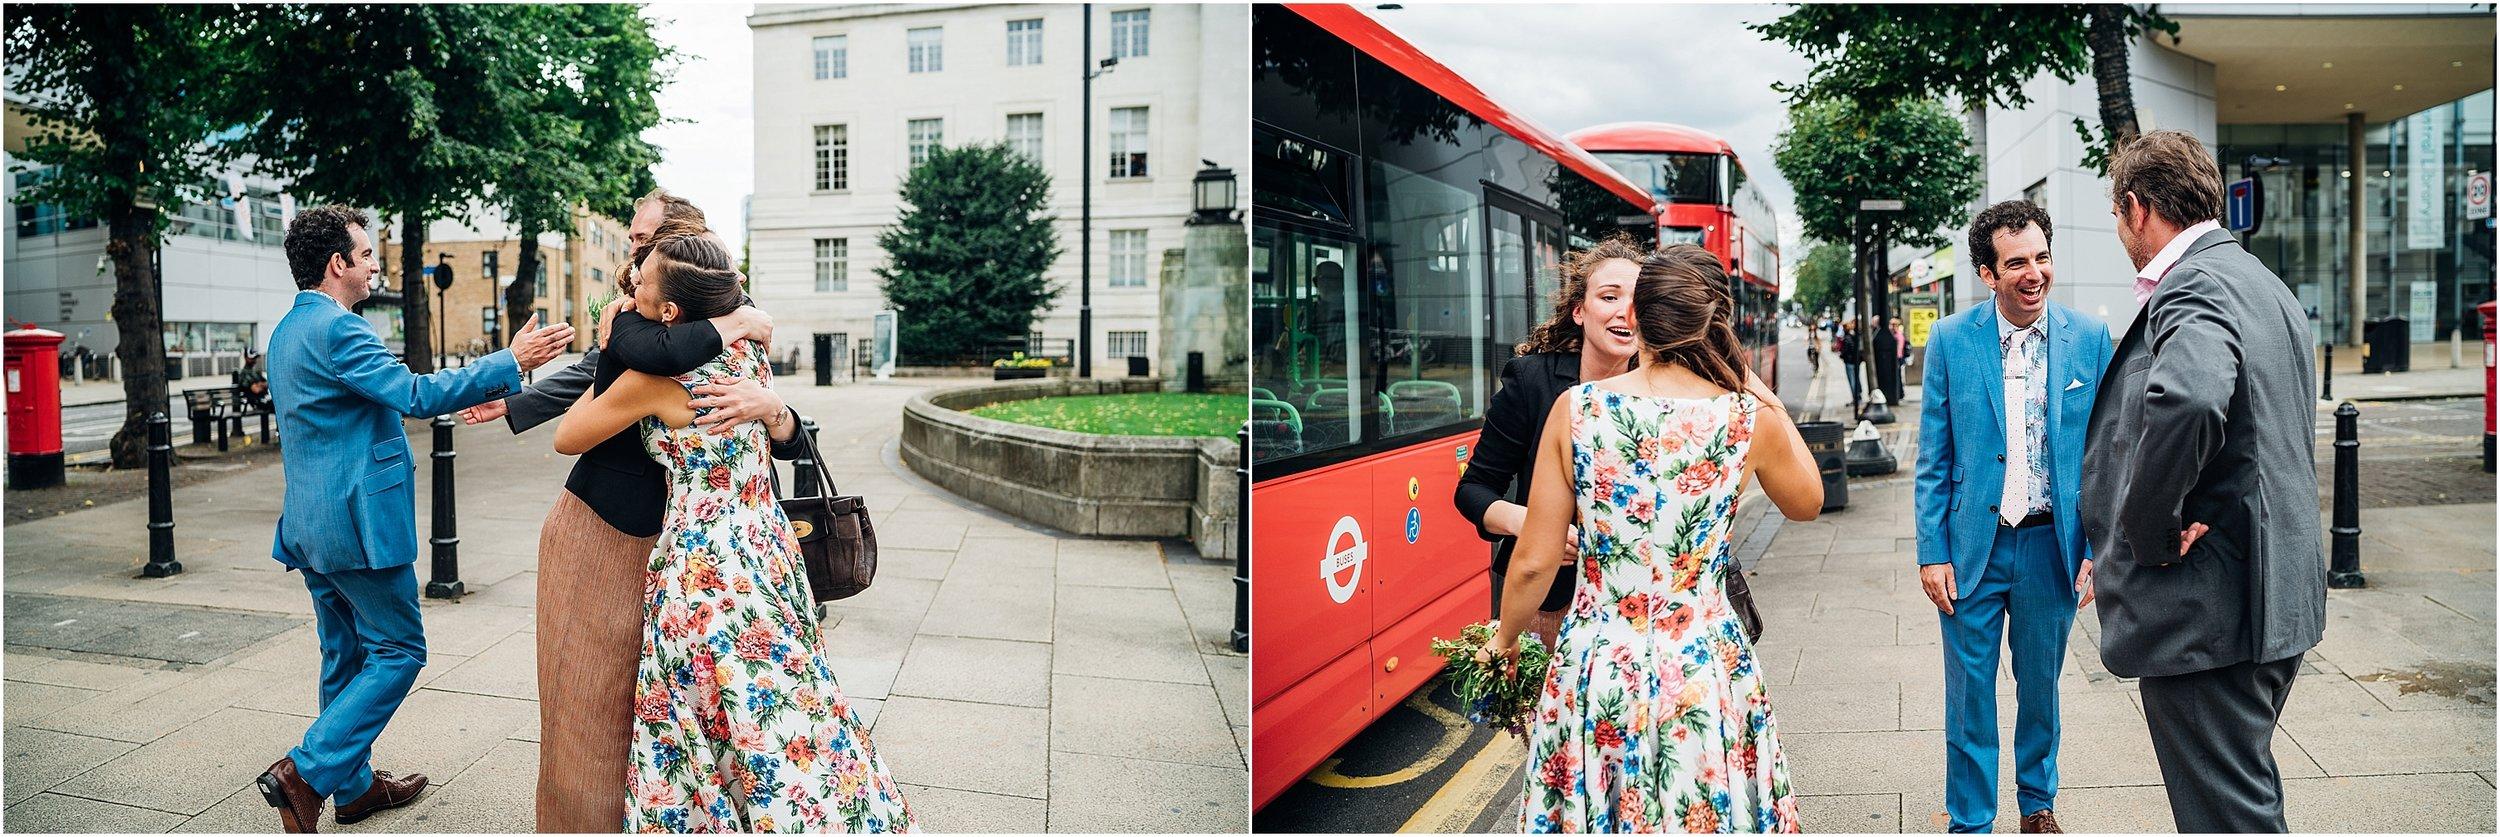 HACKNEY TOWN HALL WEDDING_0031.jpg